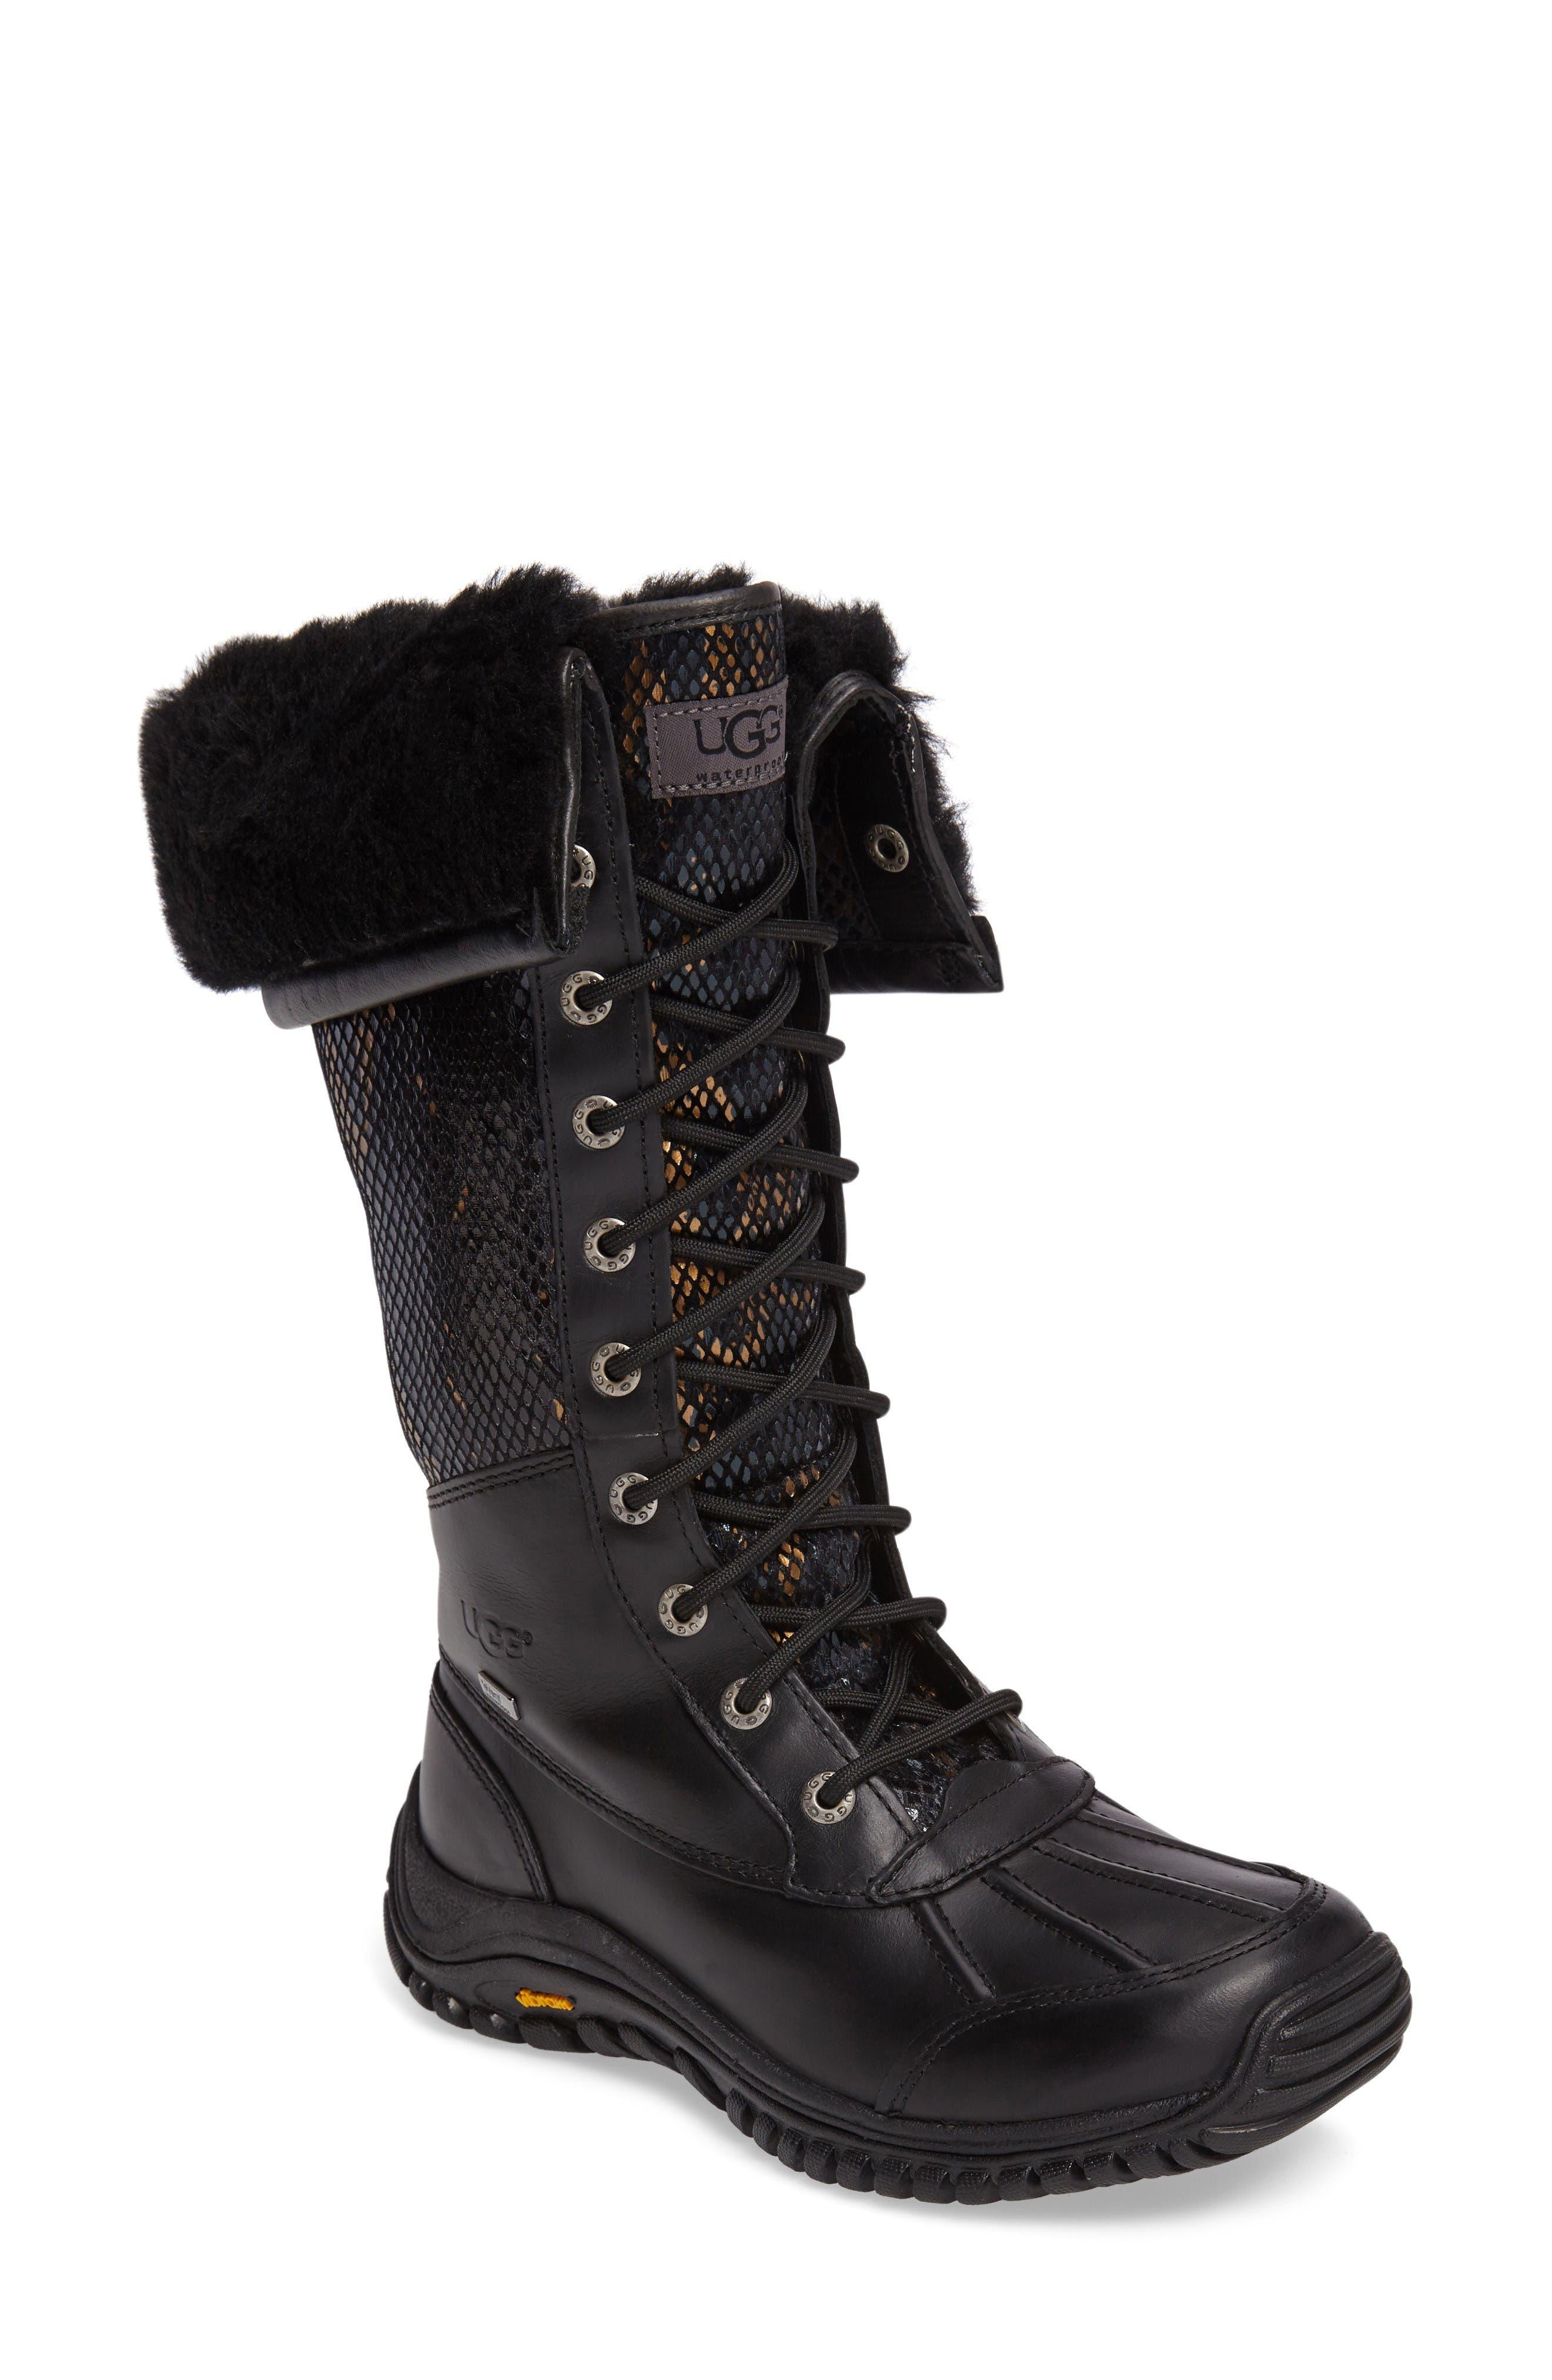 ugg adirondack velvet waterproof winter boot